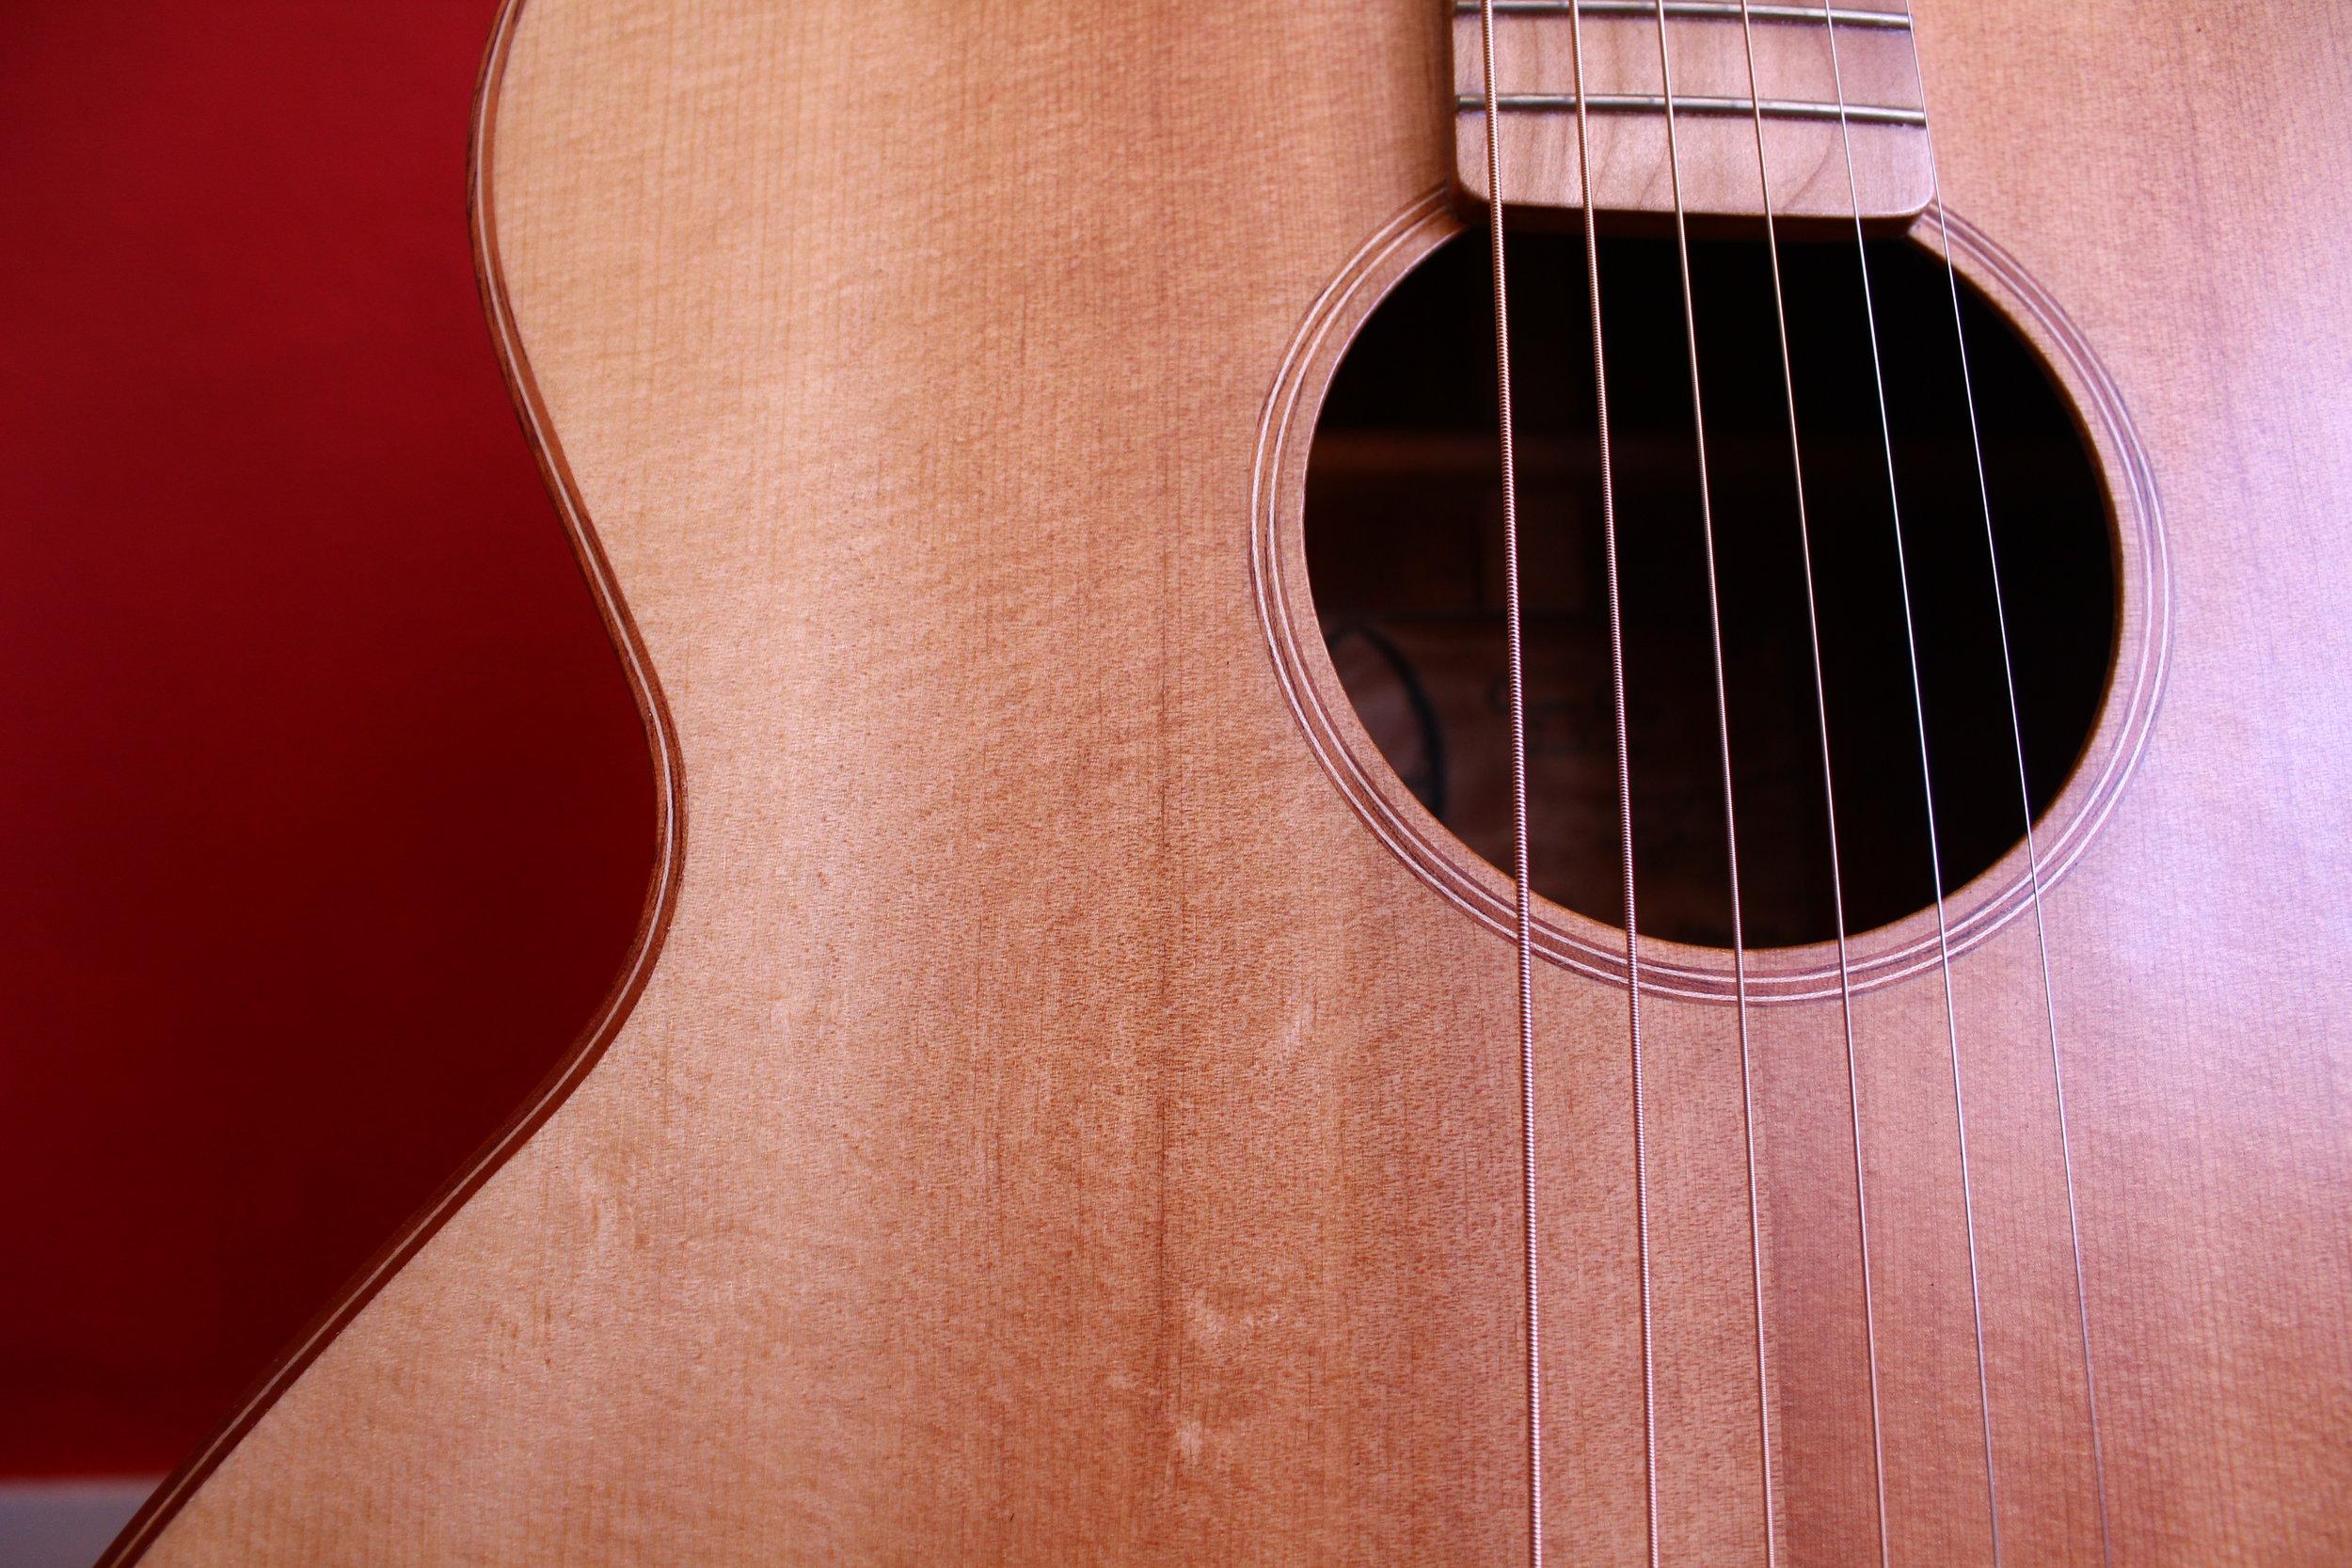 guitar binding and rosette